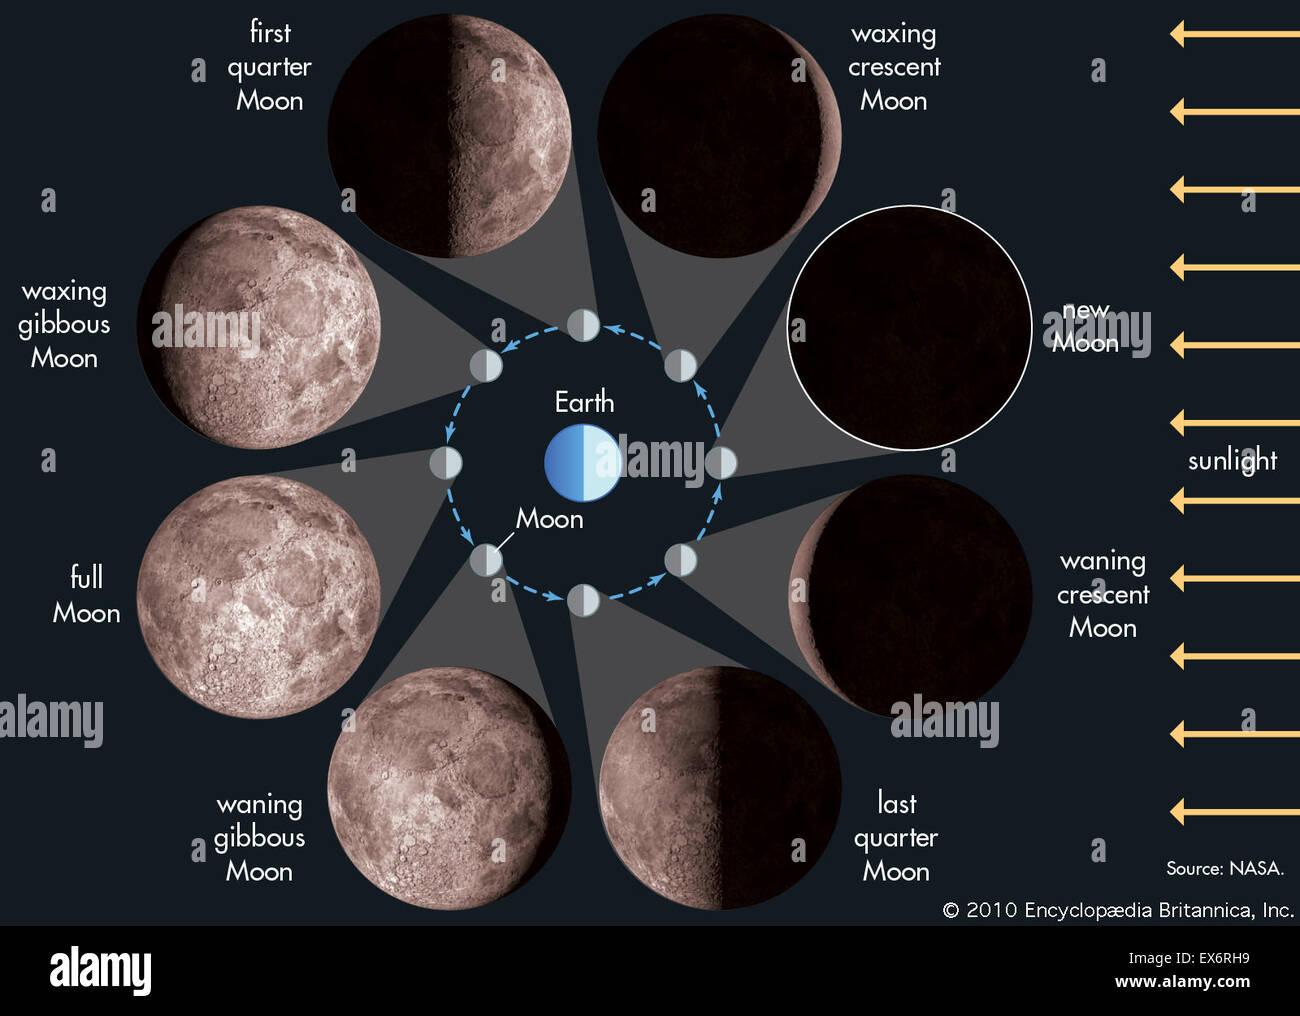 Moon phases Stock Photo: 84972757 - Alamy